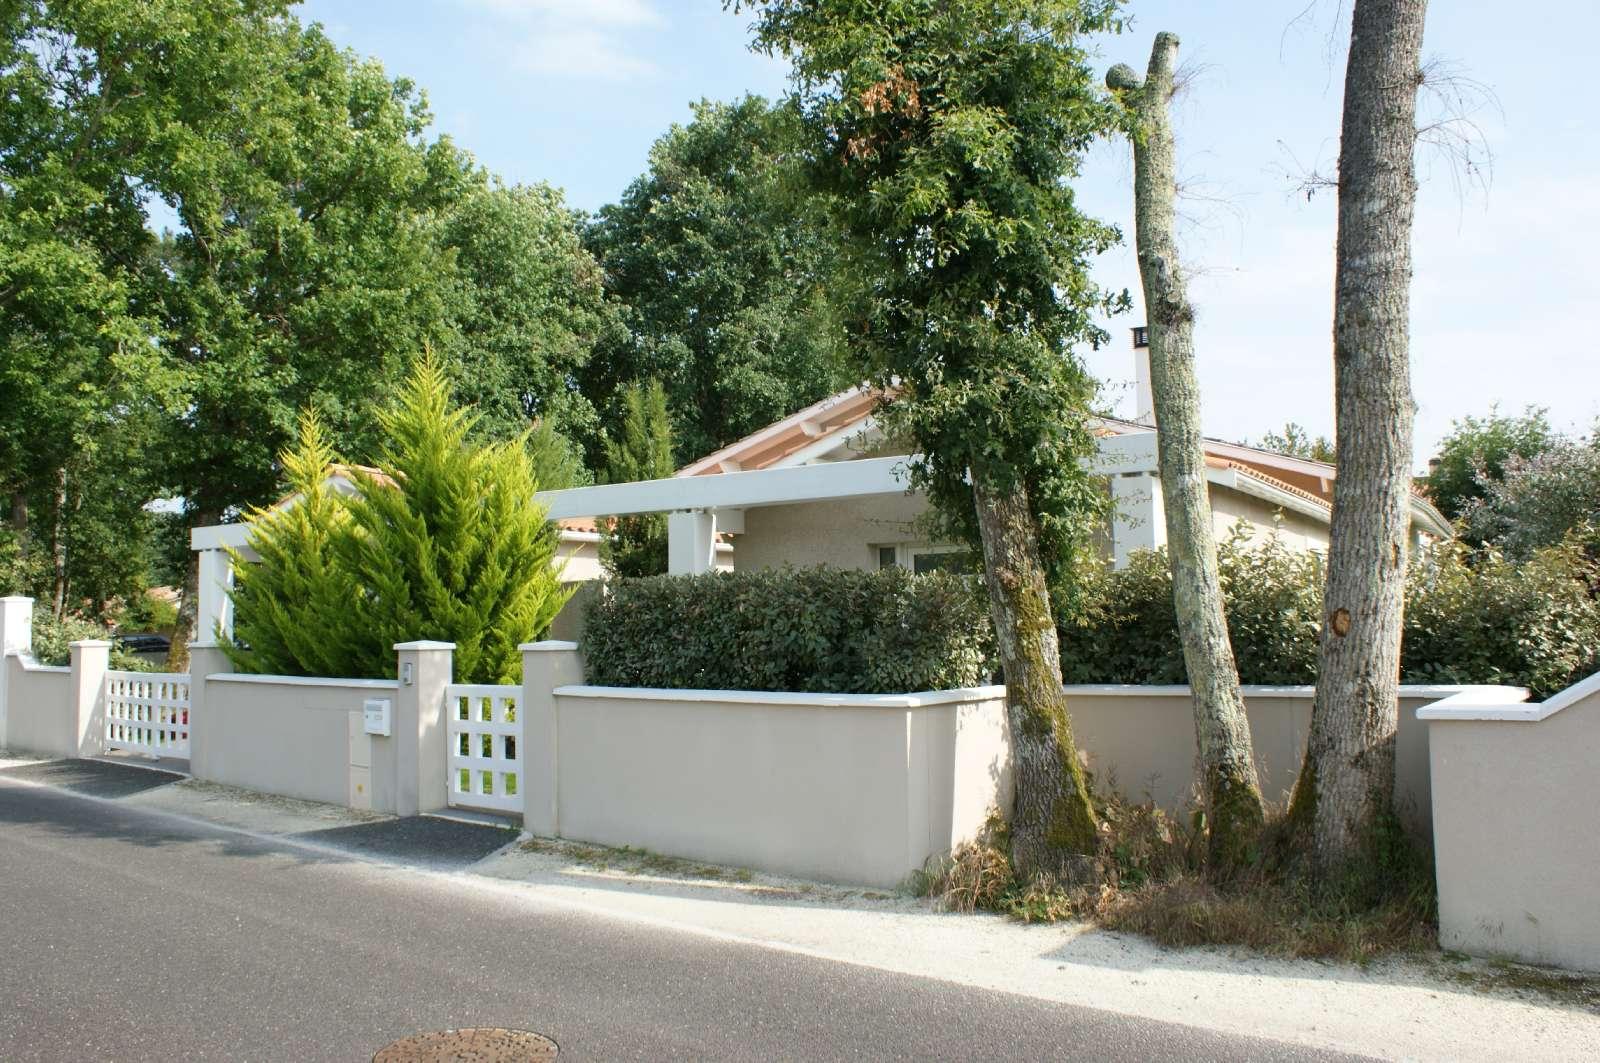 Vente villa gujan mestras 33470 159m avec 6 pi ce s for Achat maison gujan mestras